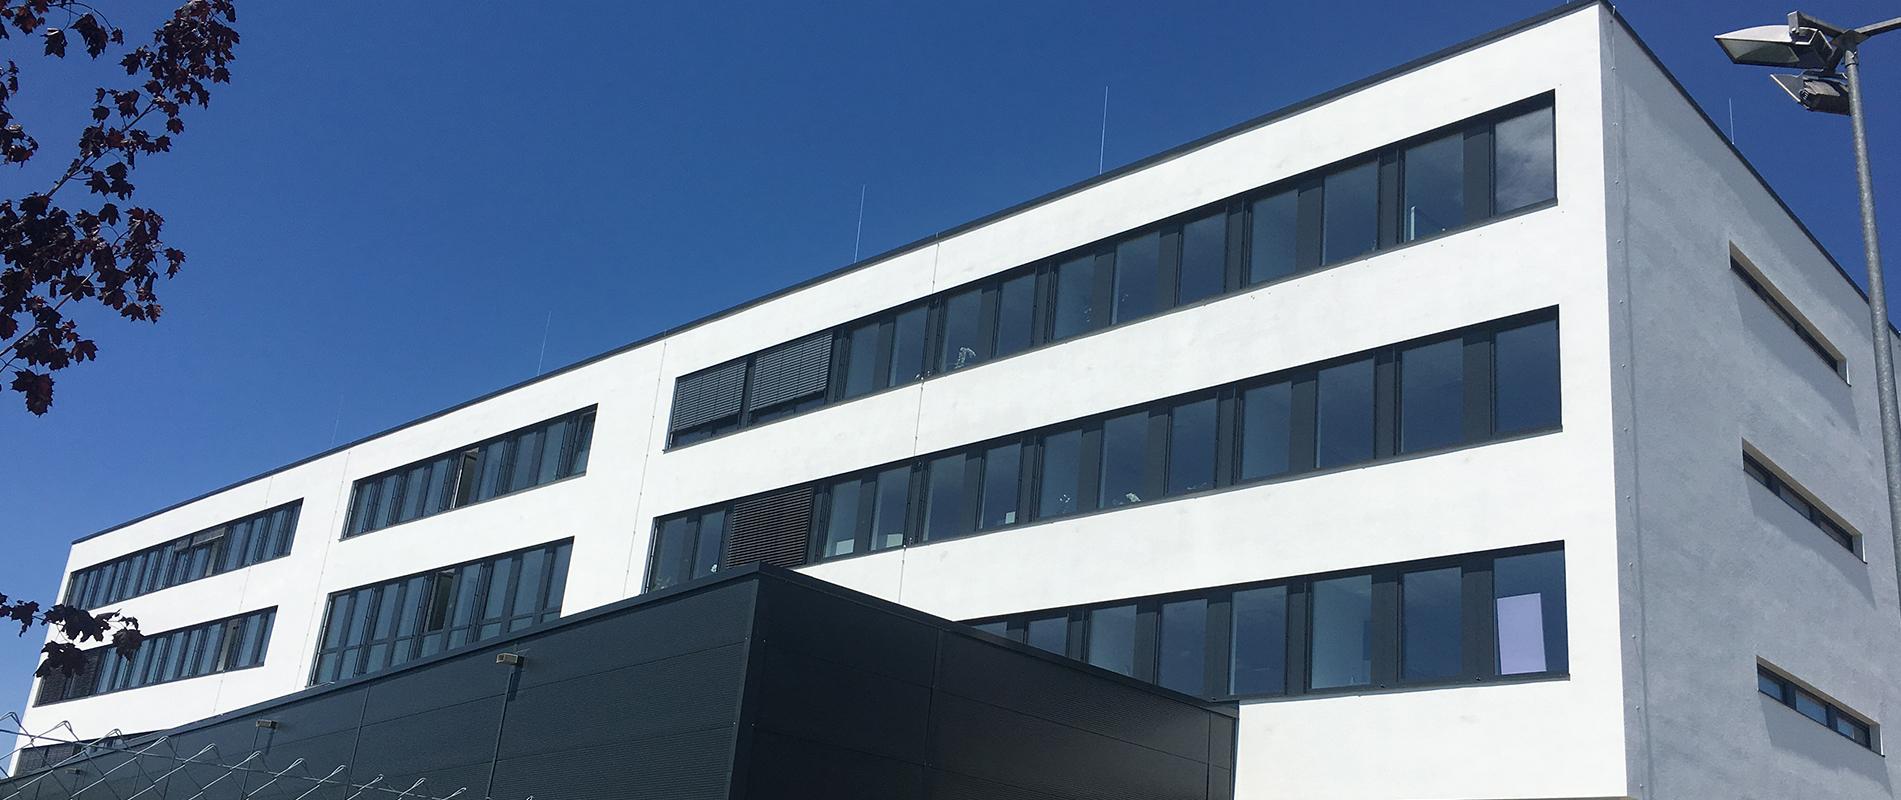 Modernisierung malerfachbetrieb rosenheim m nchen for Raumgestaltung rosenheim